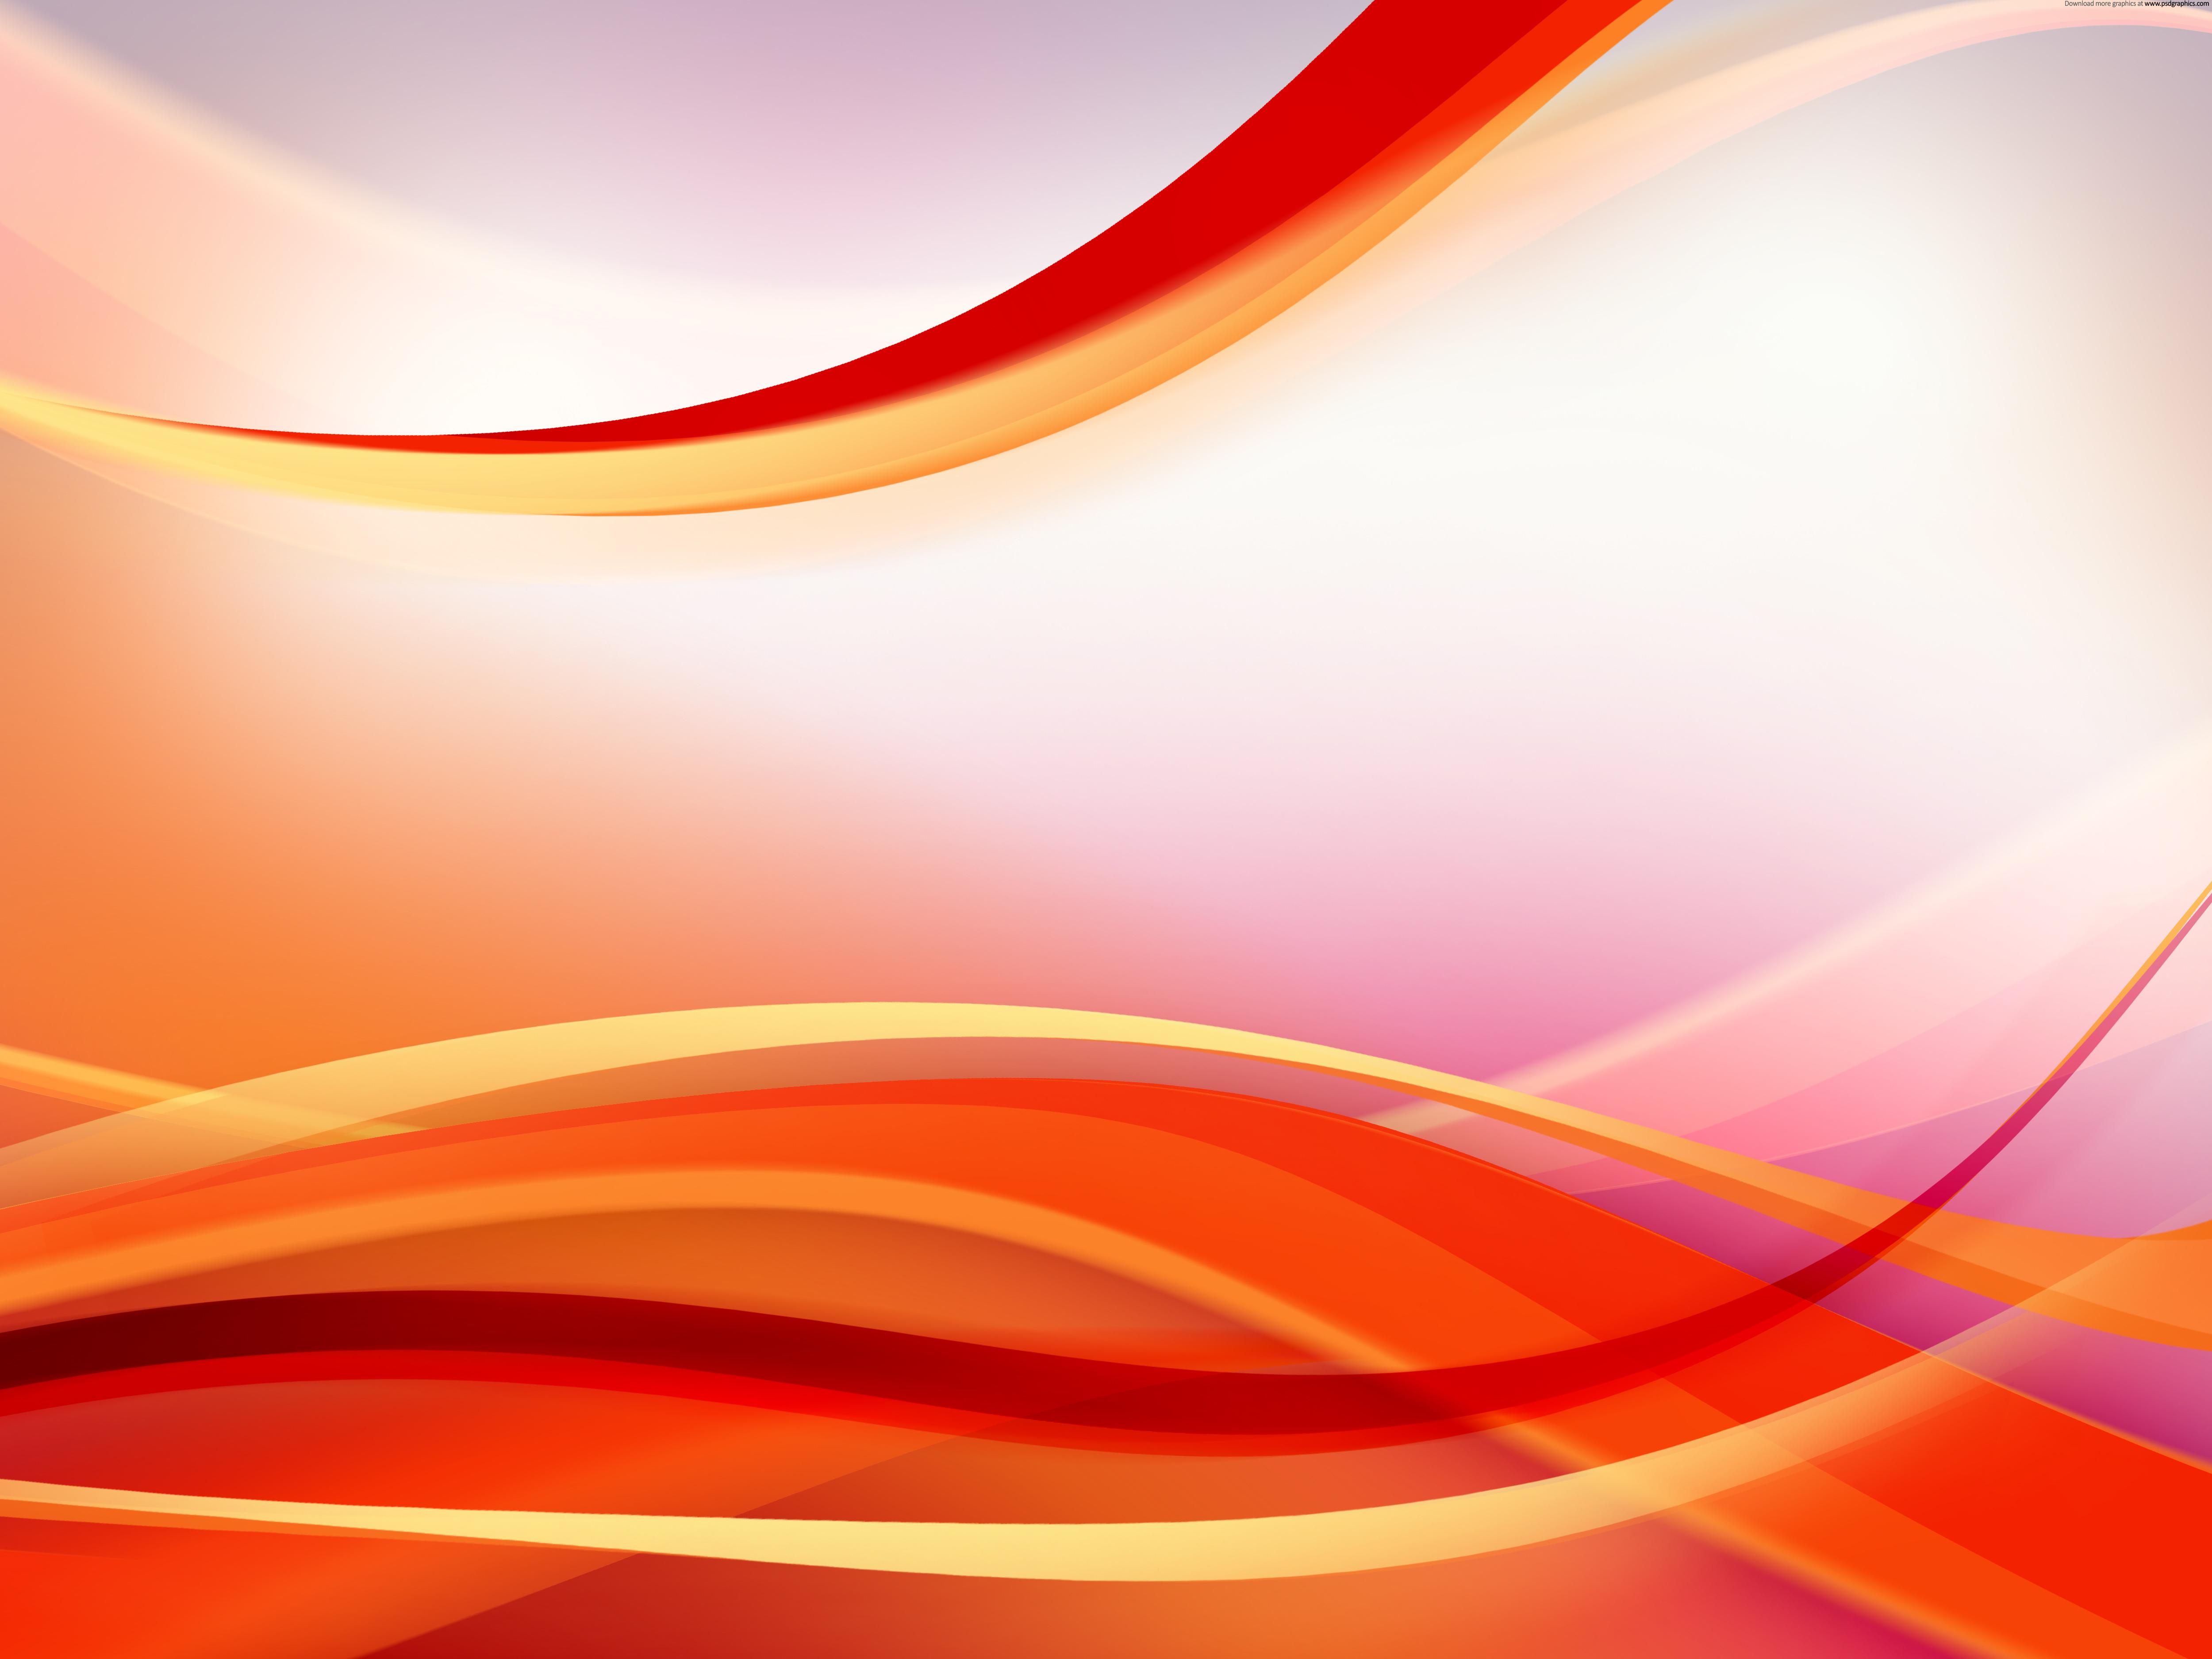 Background Images Stock Photos amp Vectors  Shutterstock